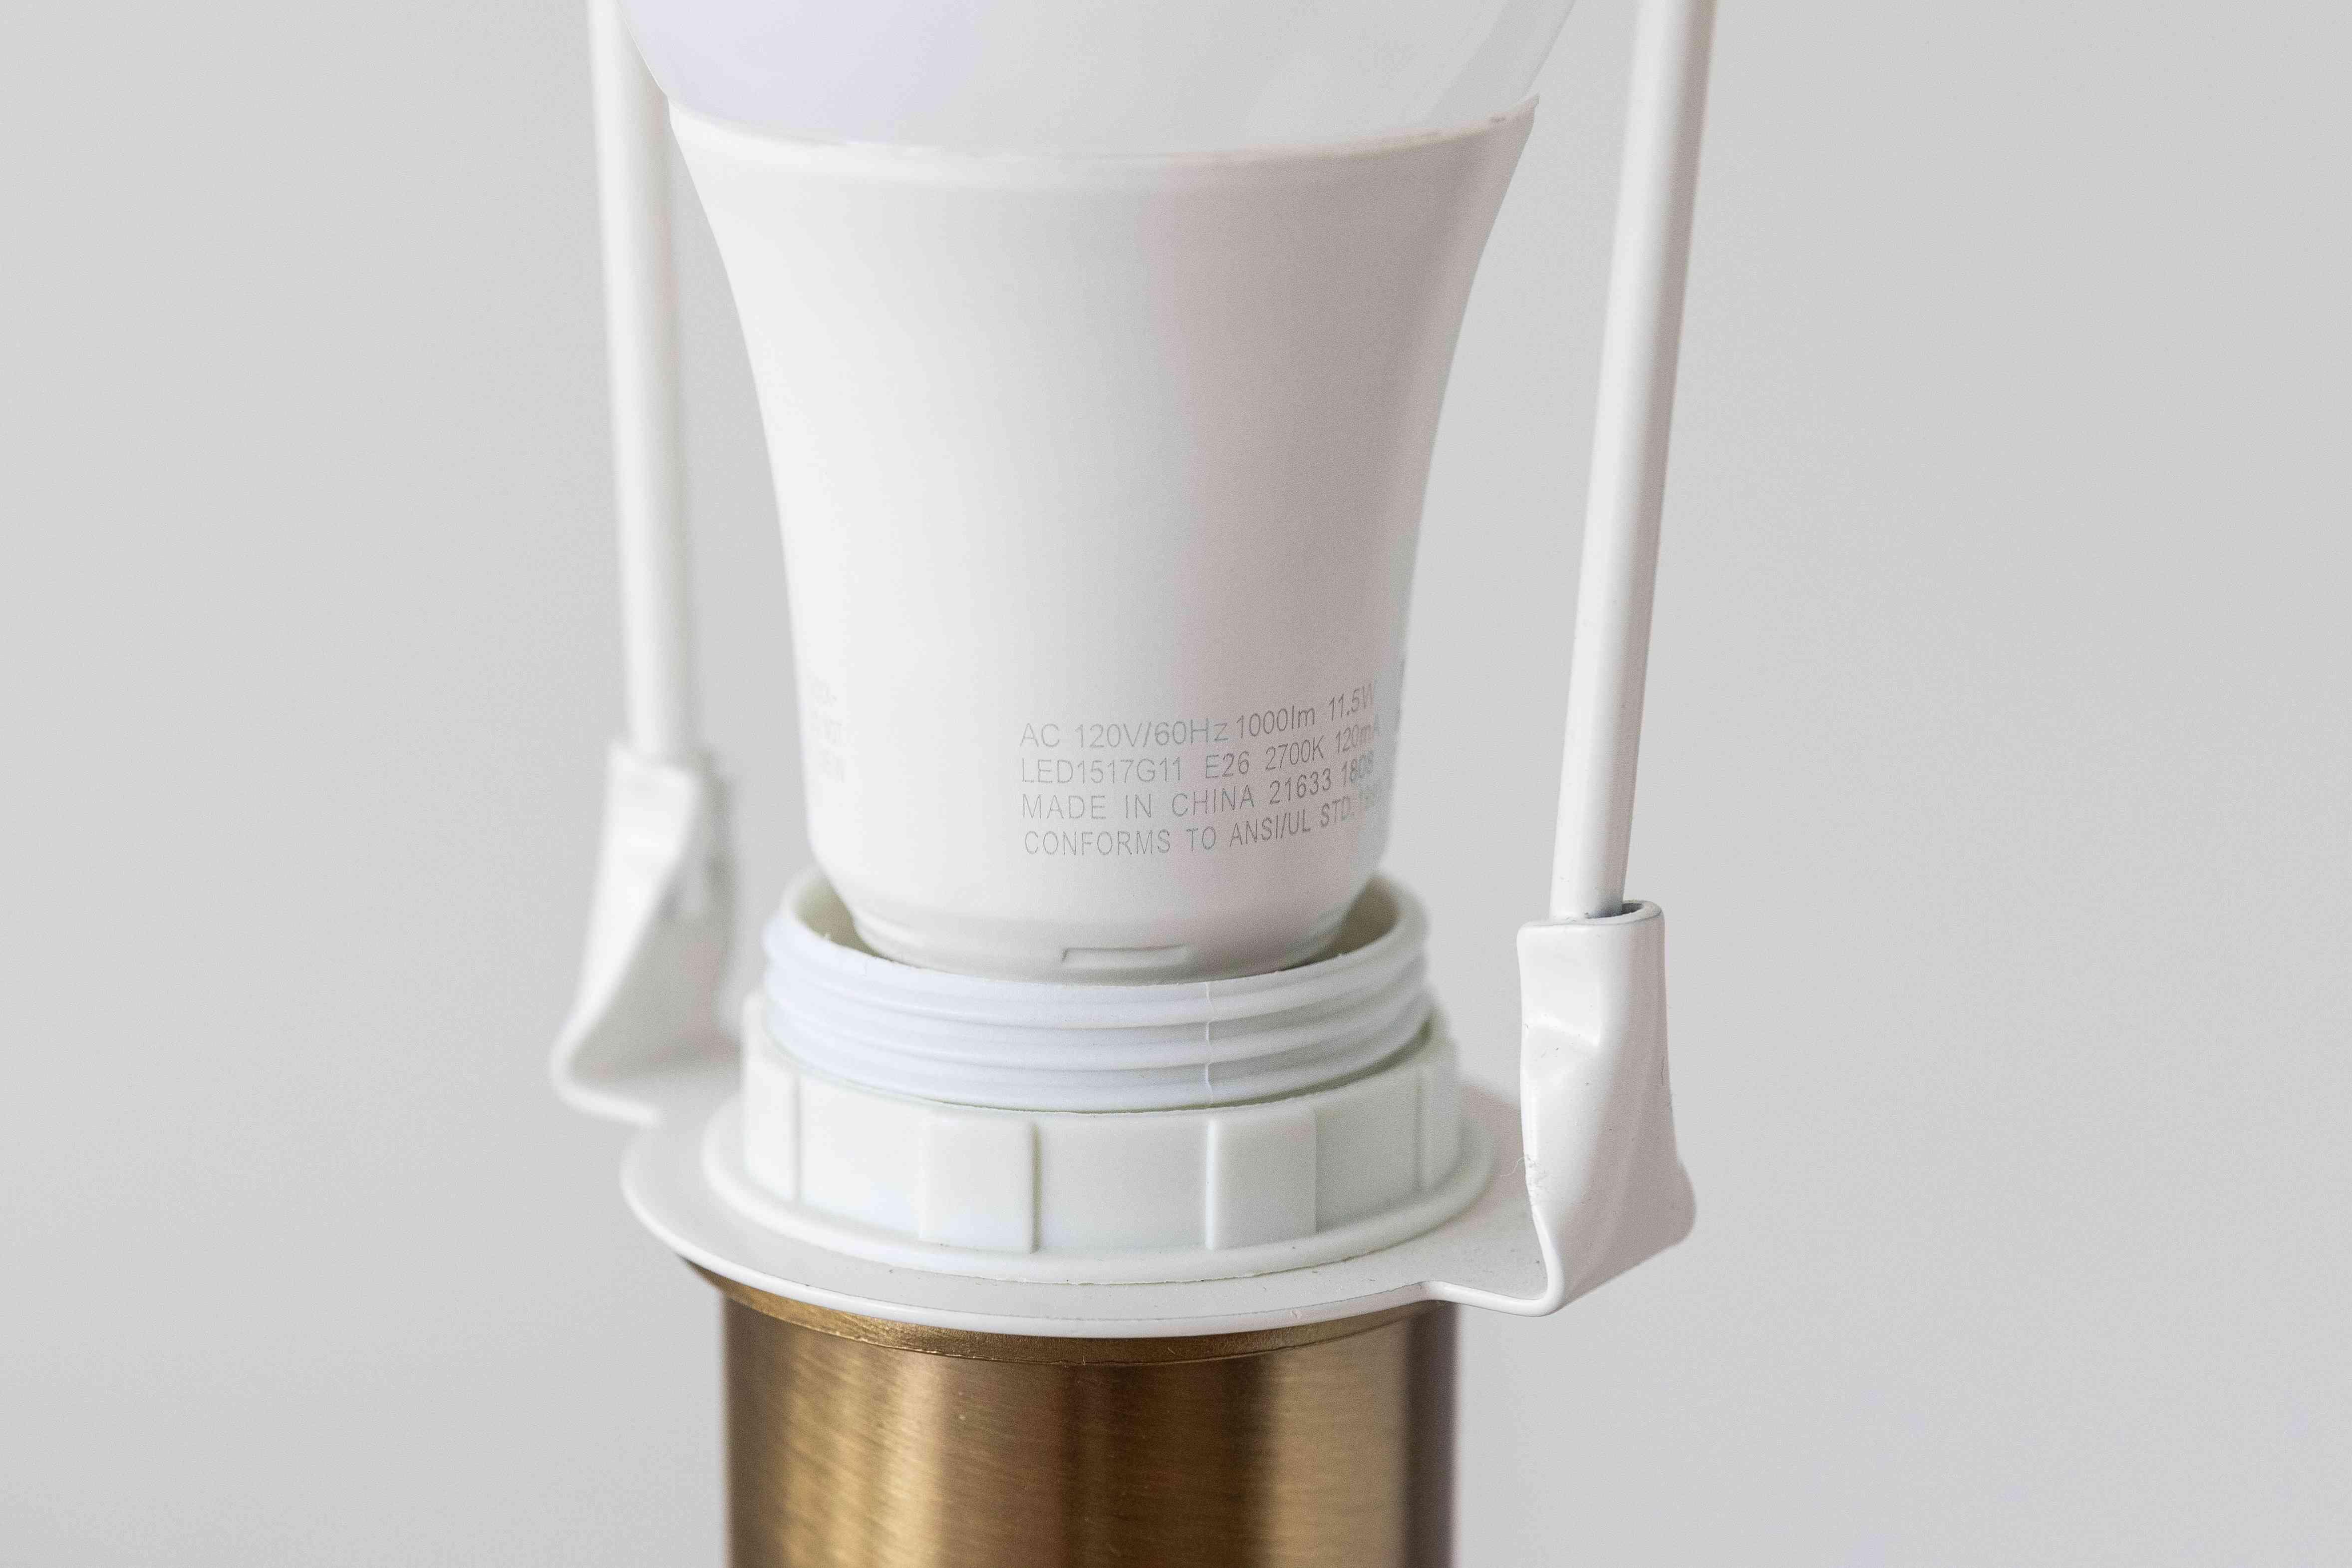 Maximum wattage label on bottom of light bulb in fixture